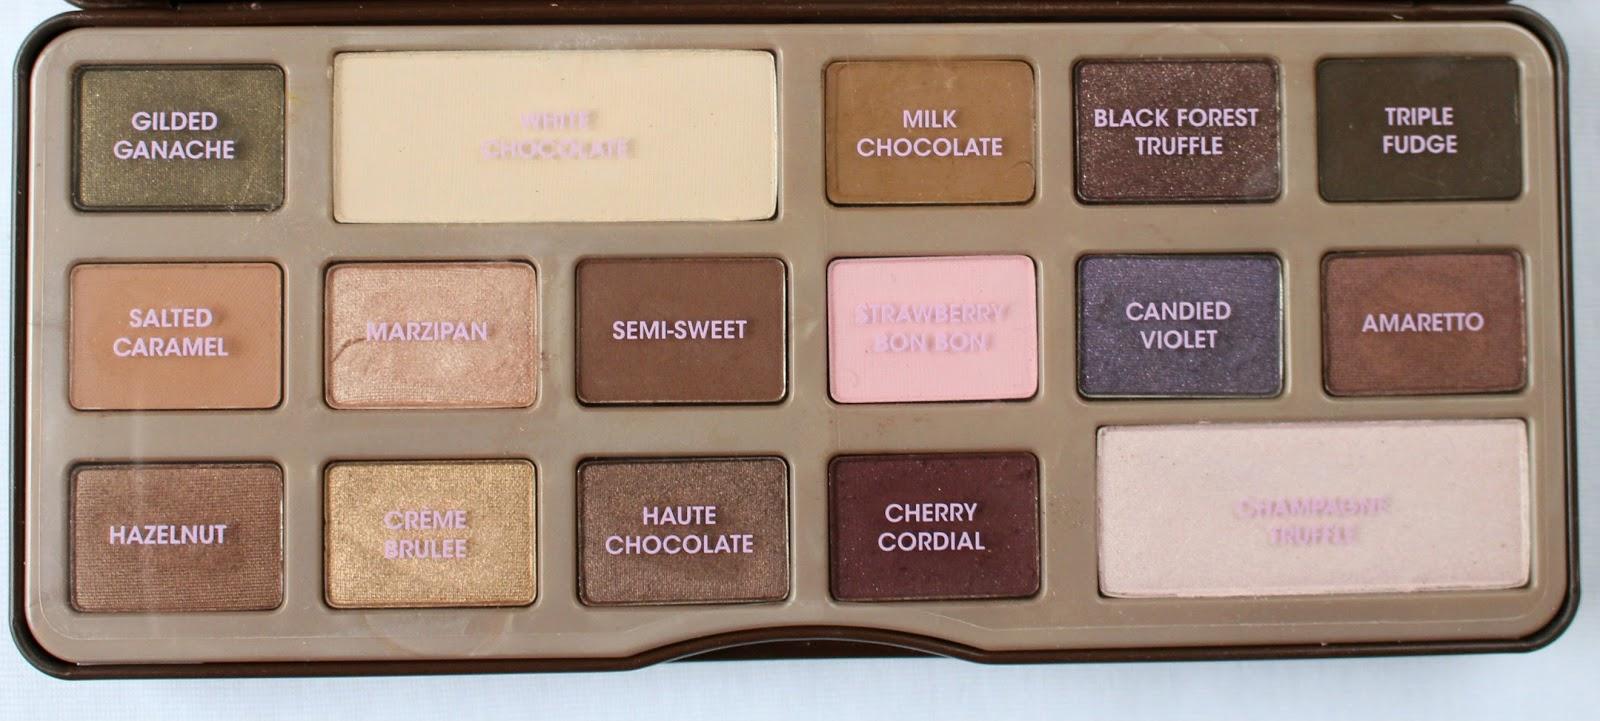 Too Faced Semi Sweet Chocolate Bar & Original Chocolate Bar Revew ...